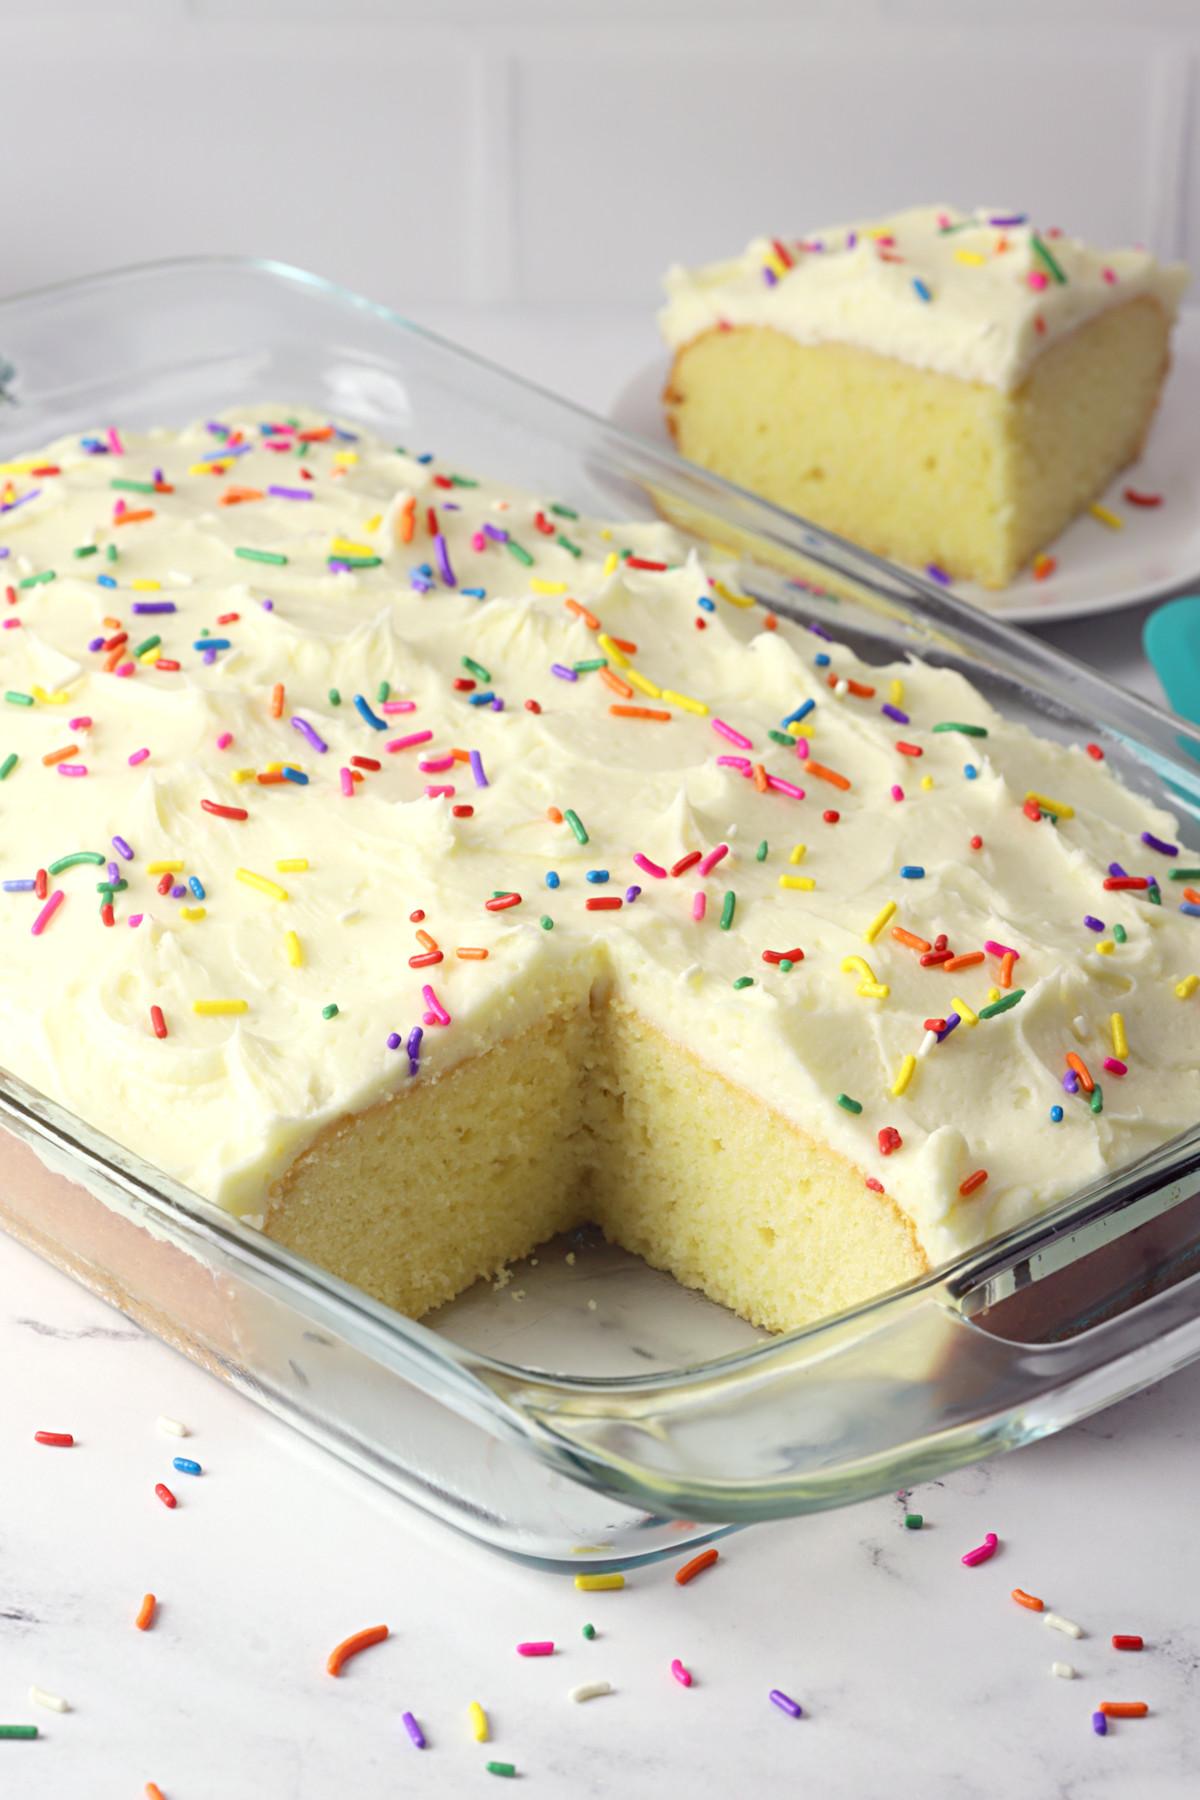 Vanilla sheet cake in a glass pan.